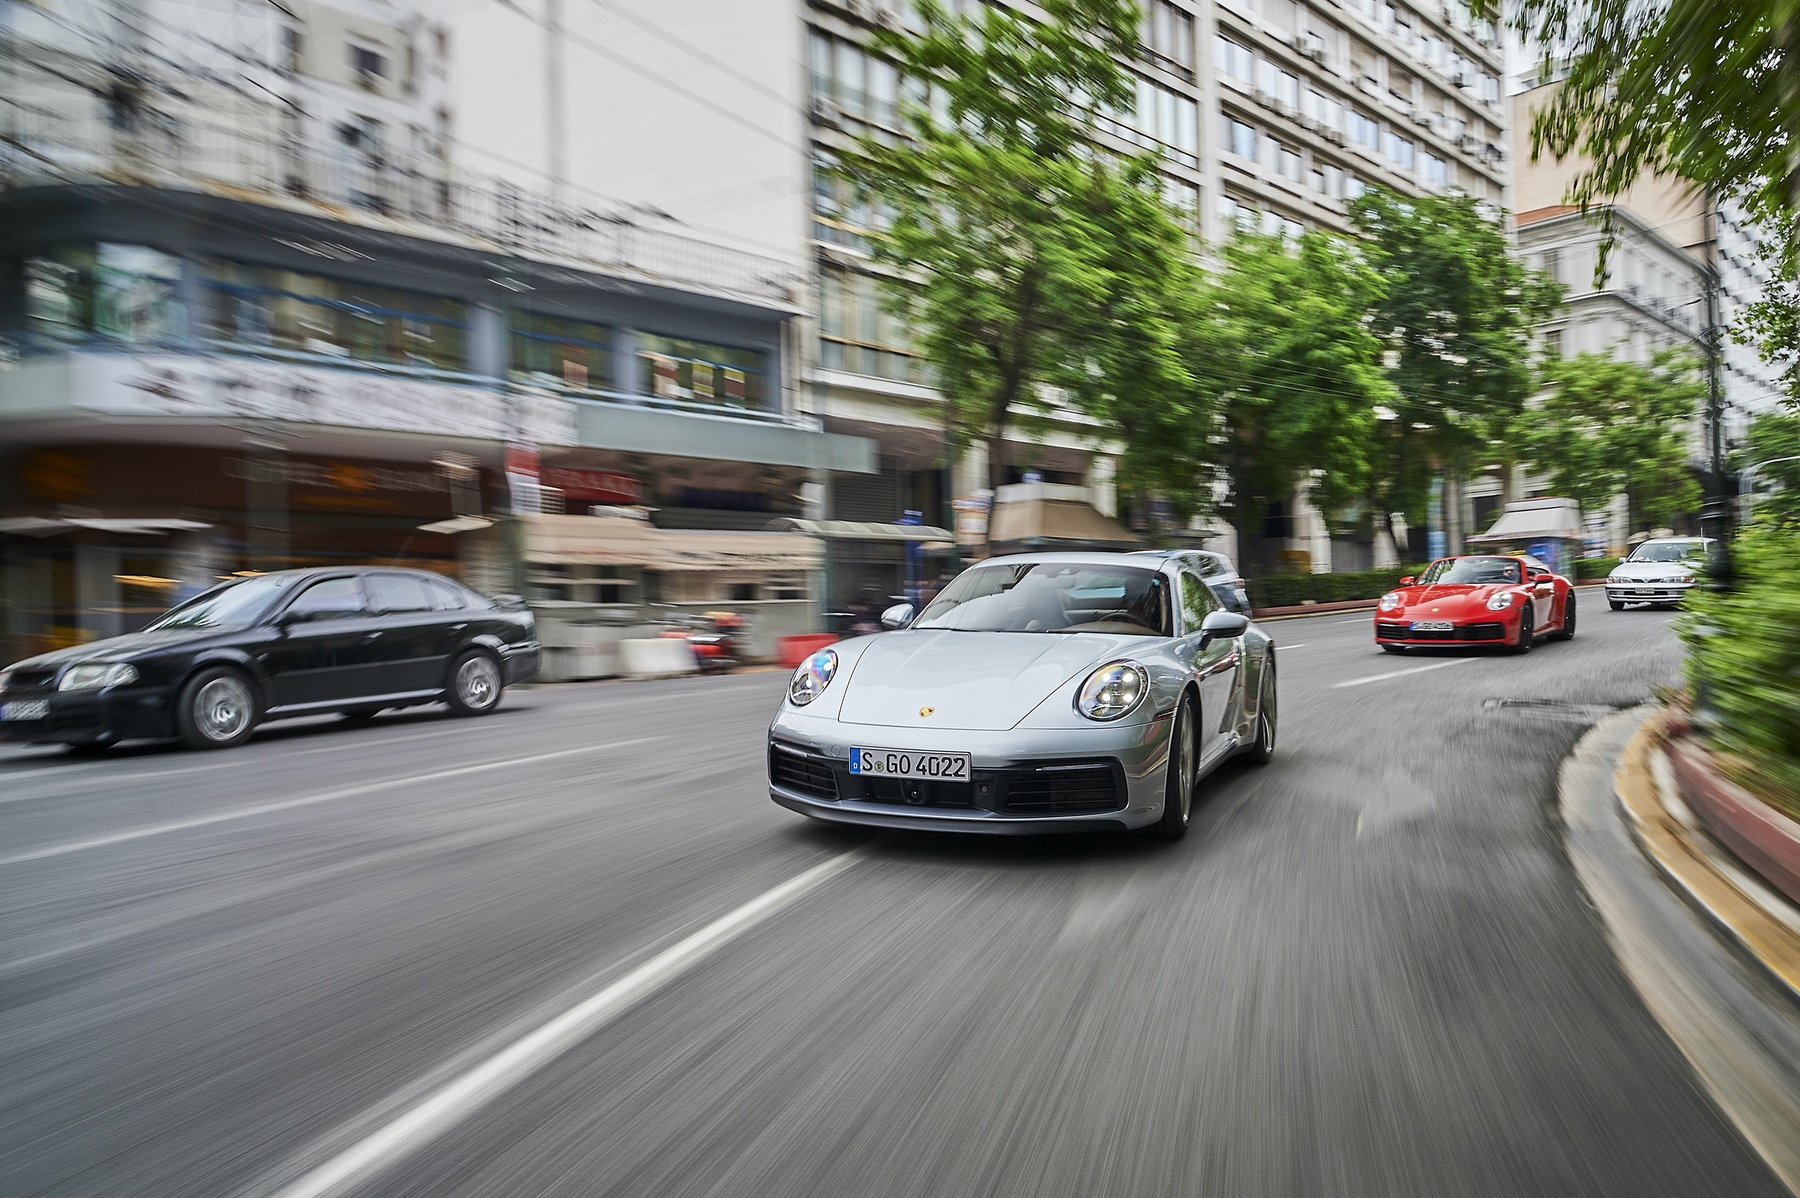 Test_Drive_Porsche_911_Athens_0186